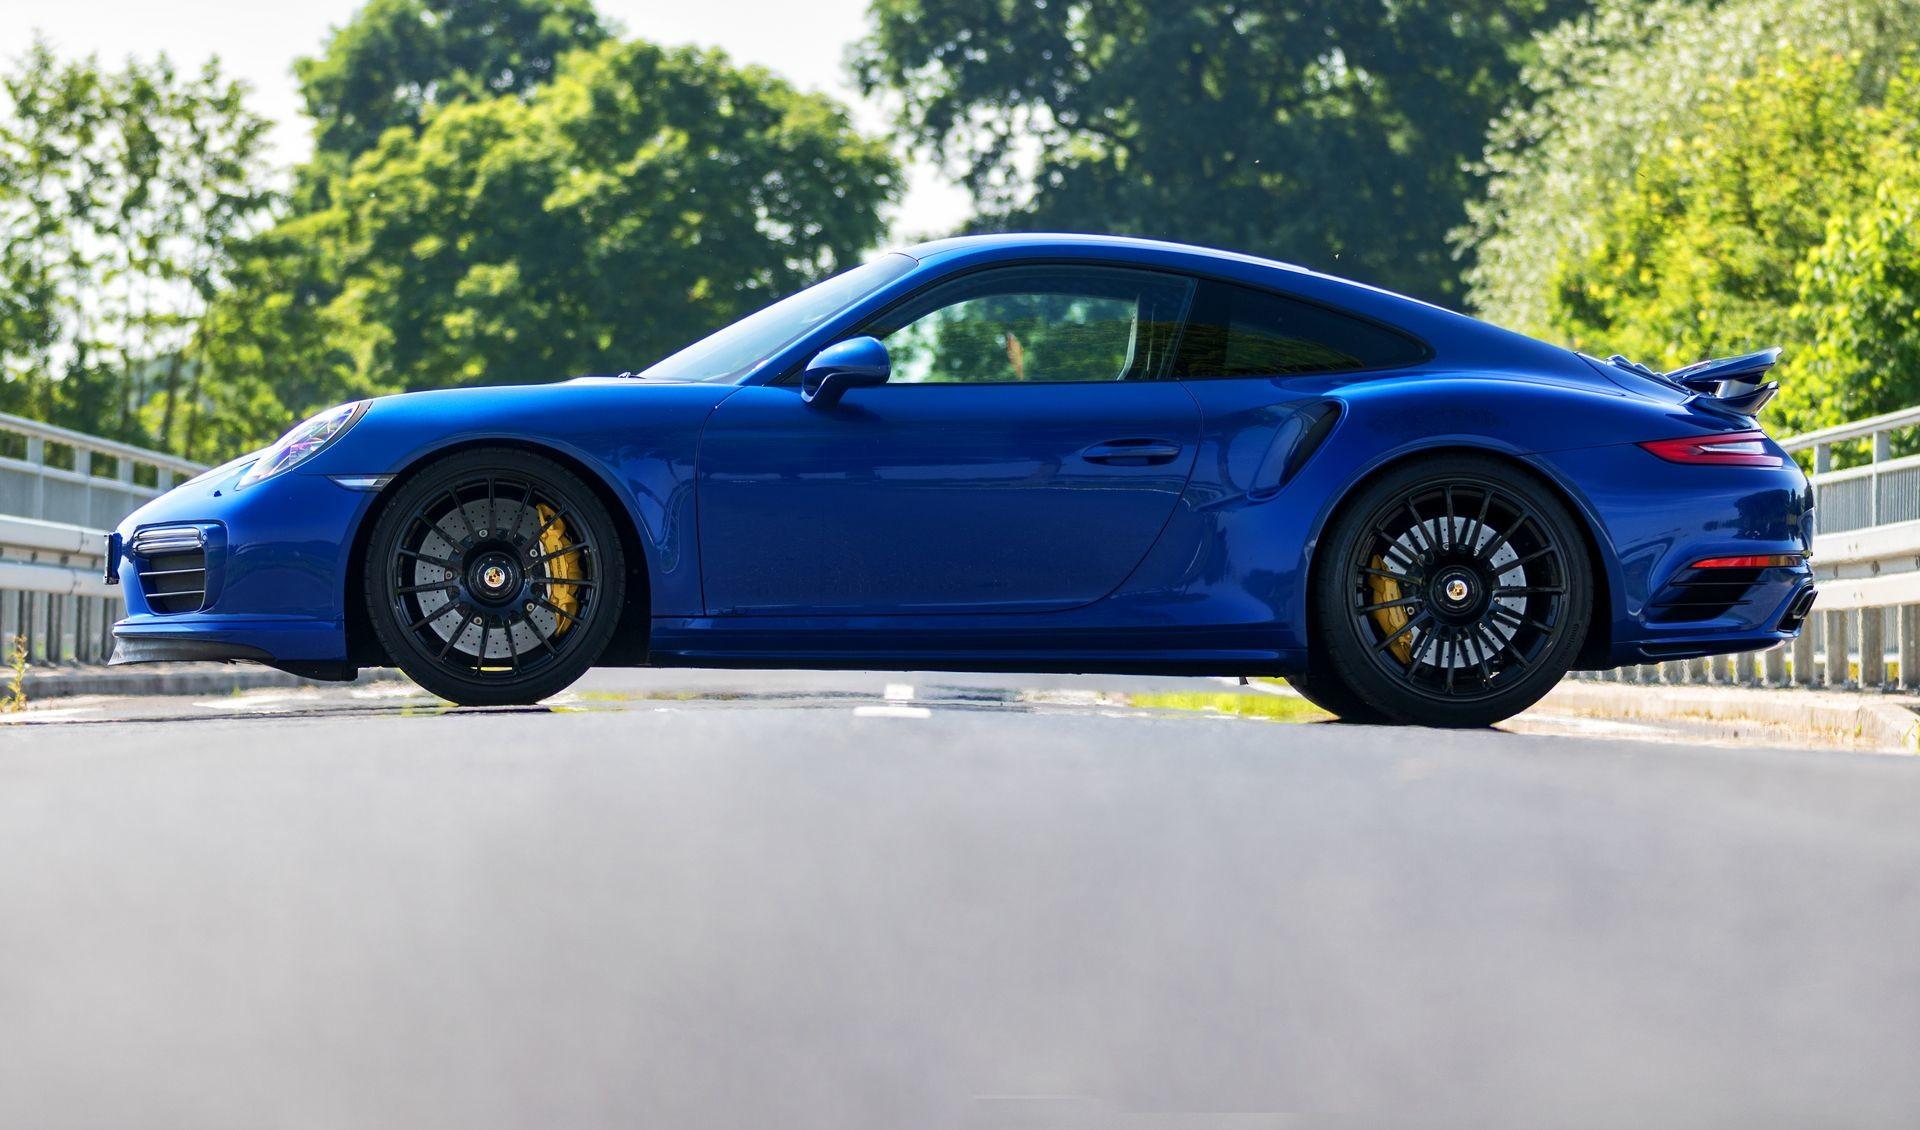 Foto de Porsche 911 Turbo S Blue Arrow (21/25)